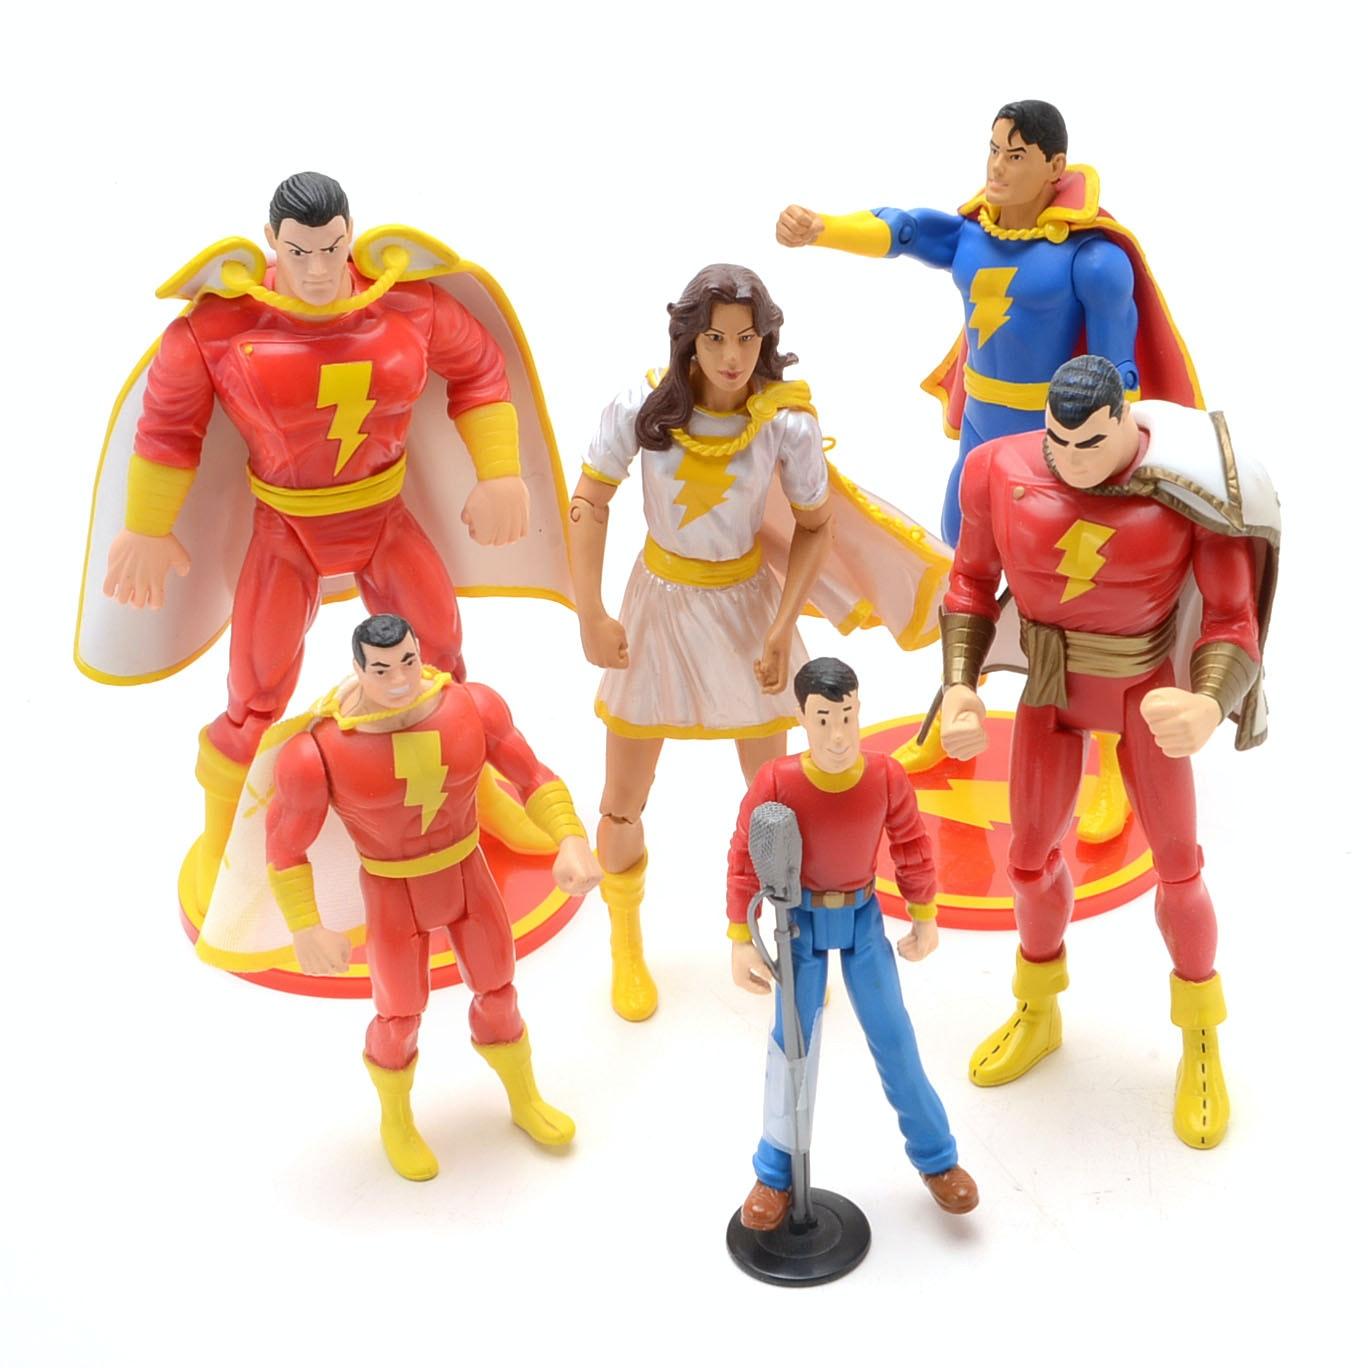 Collection of DC Comics Shazam! action Figures